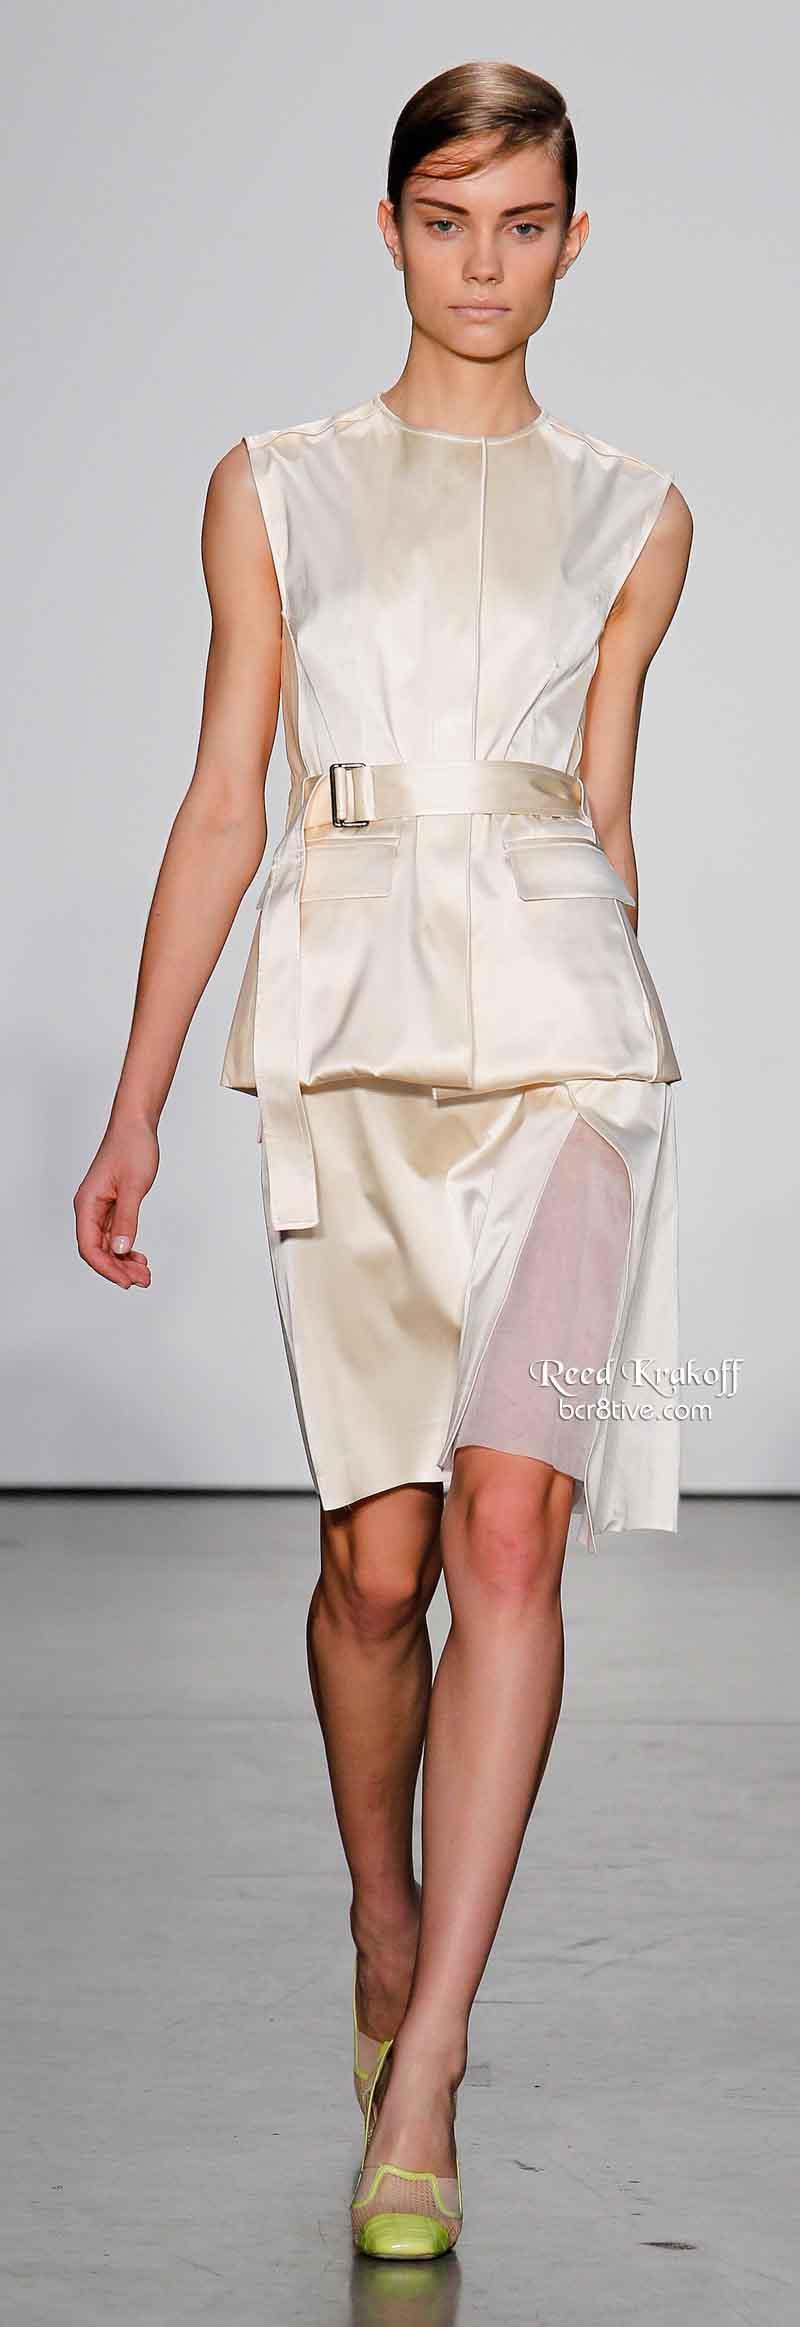 Reed Krakoff Spring 2014